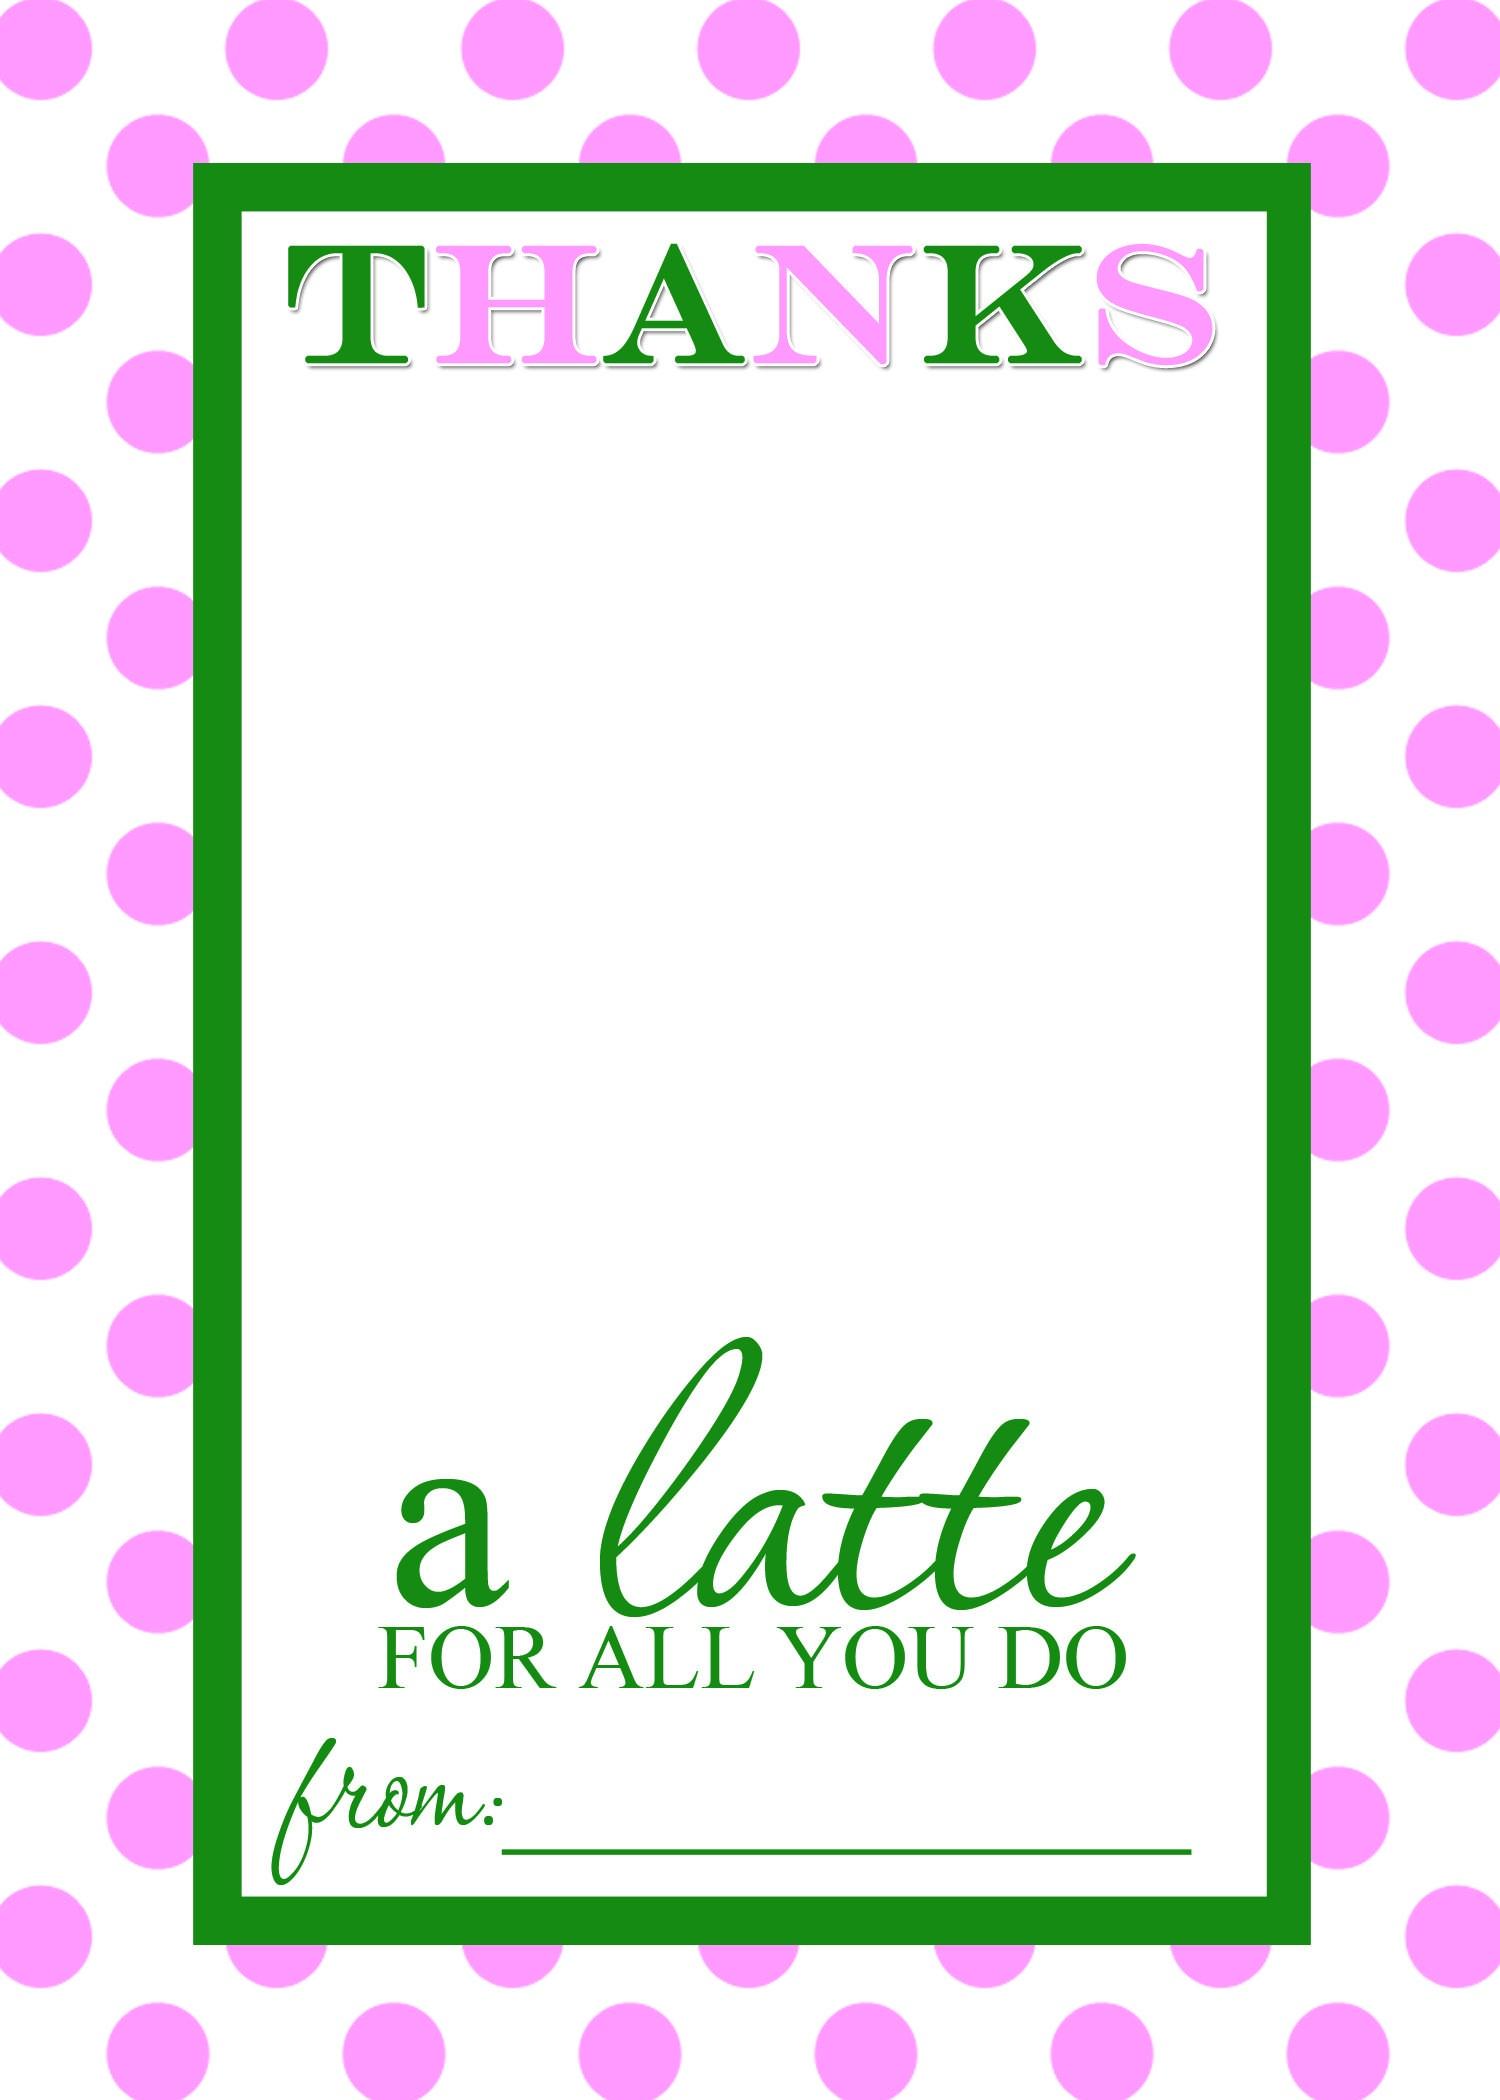 Thanks A Latte Free Printable Gift Card Holder Teacher Gift | Diy - Thanks A Latte Free Printable Card